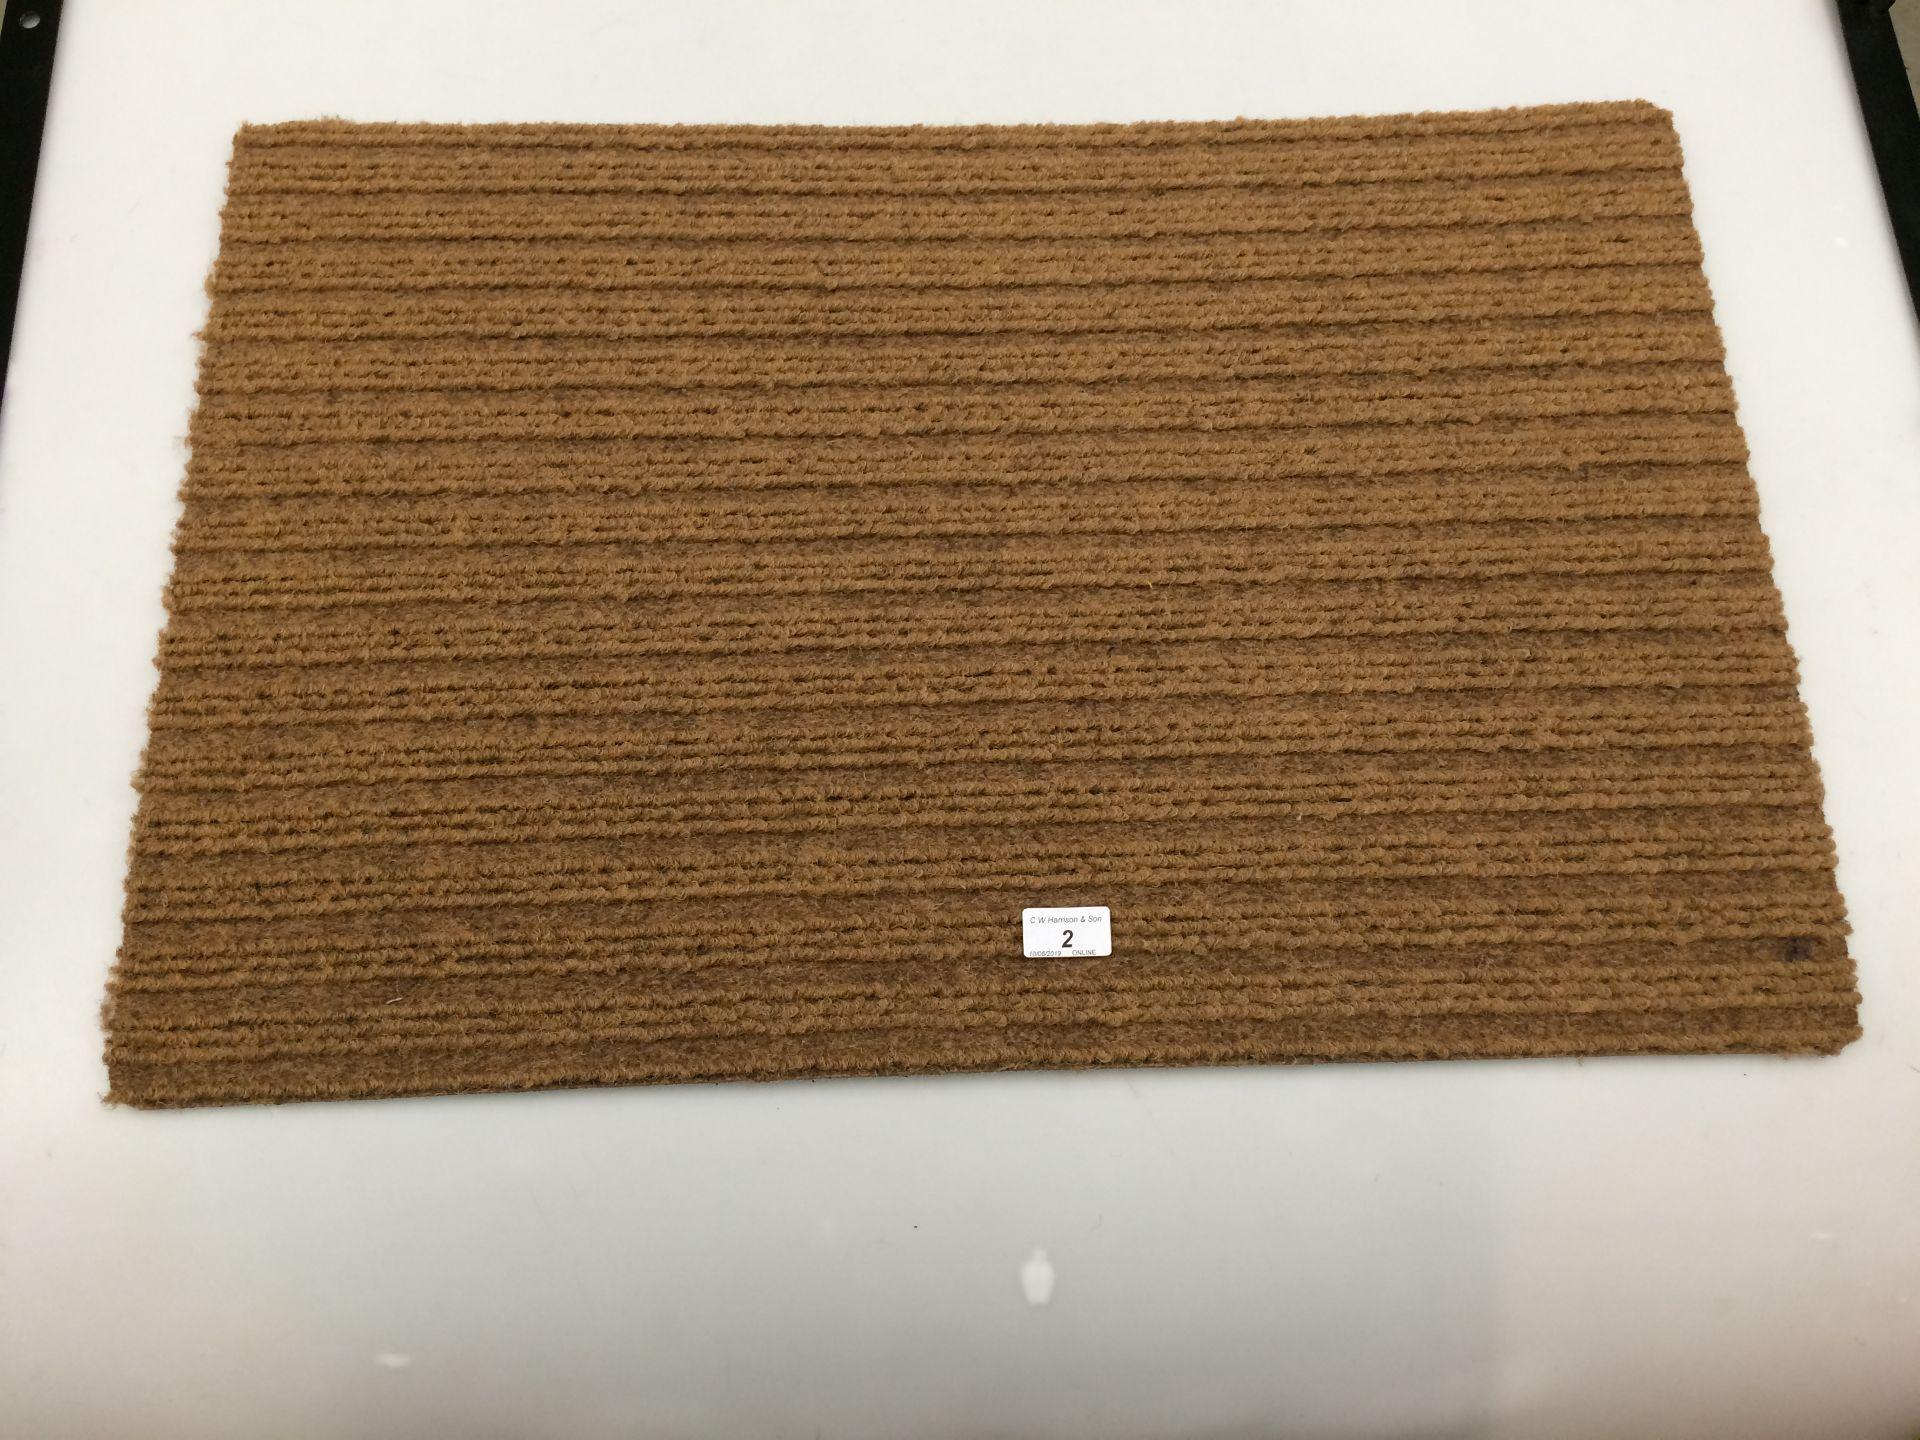 Lot 2 - 10 x brown door mats with rubber anti-slip inlay each 50 x 75cm